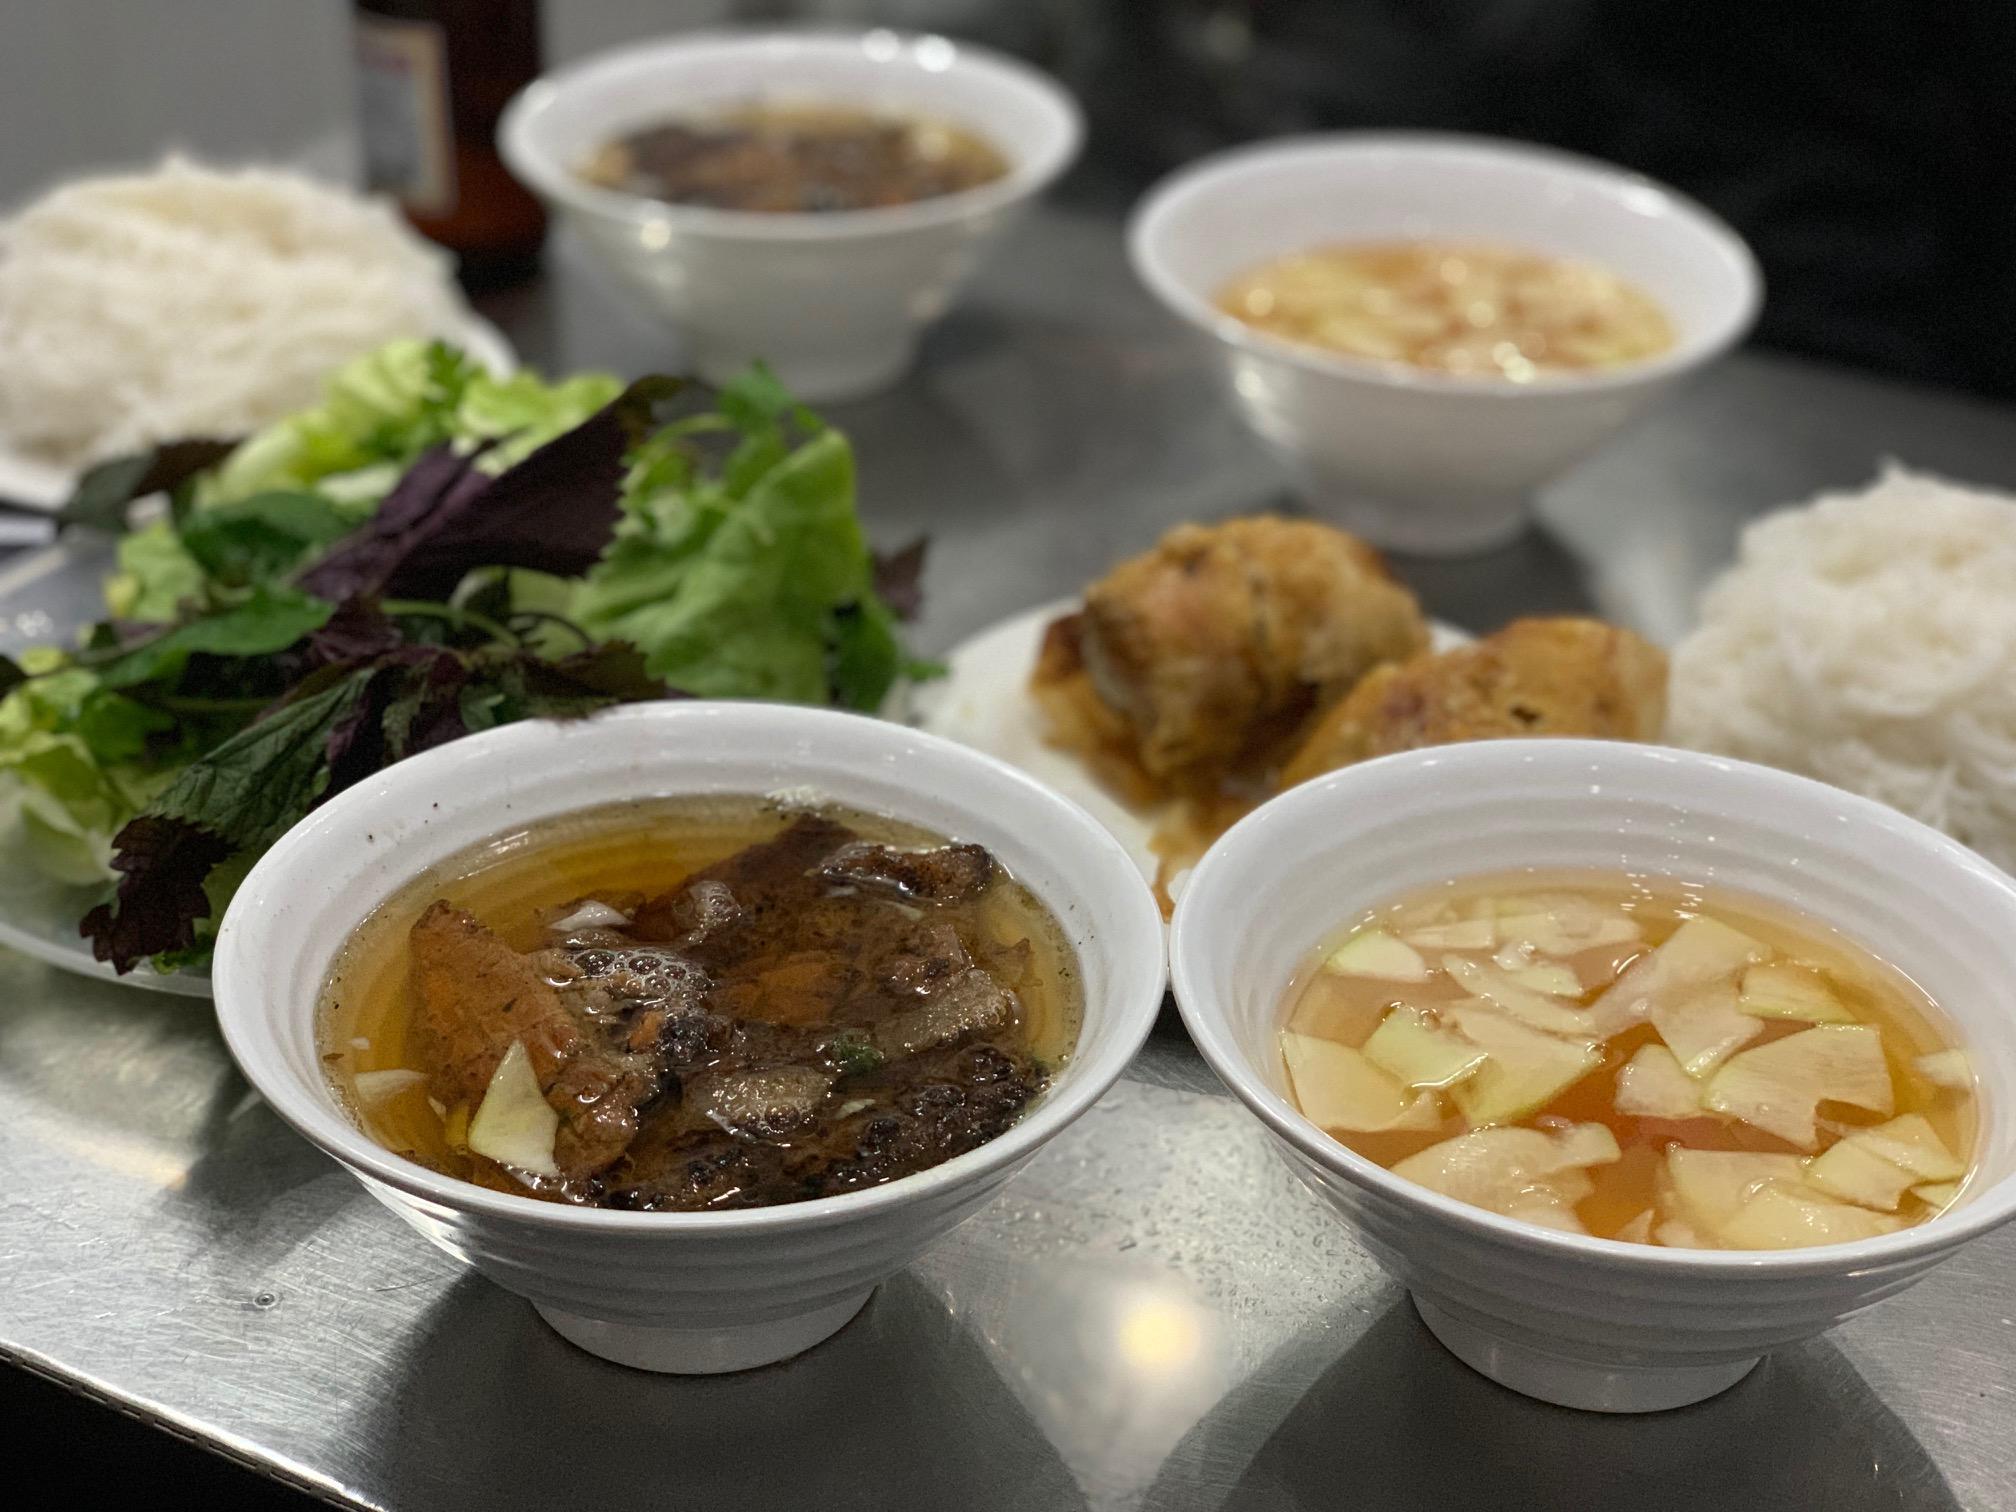 9 - orders of Bun Cha consumed (our favorite)